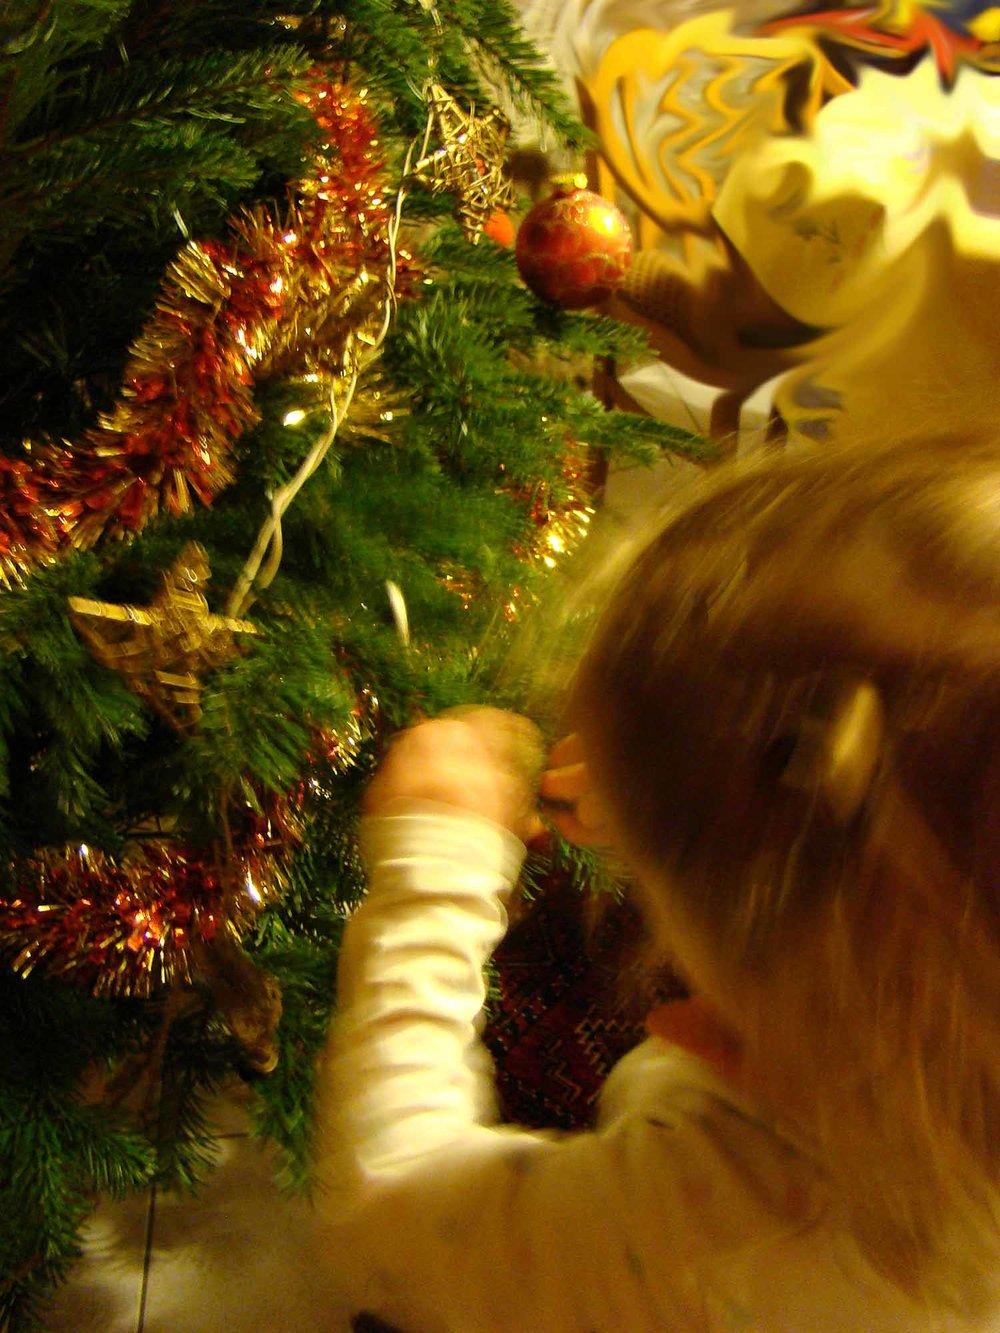 Delphine_decorations.jpg